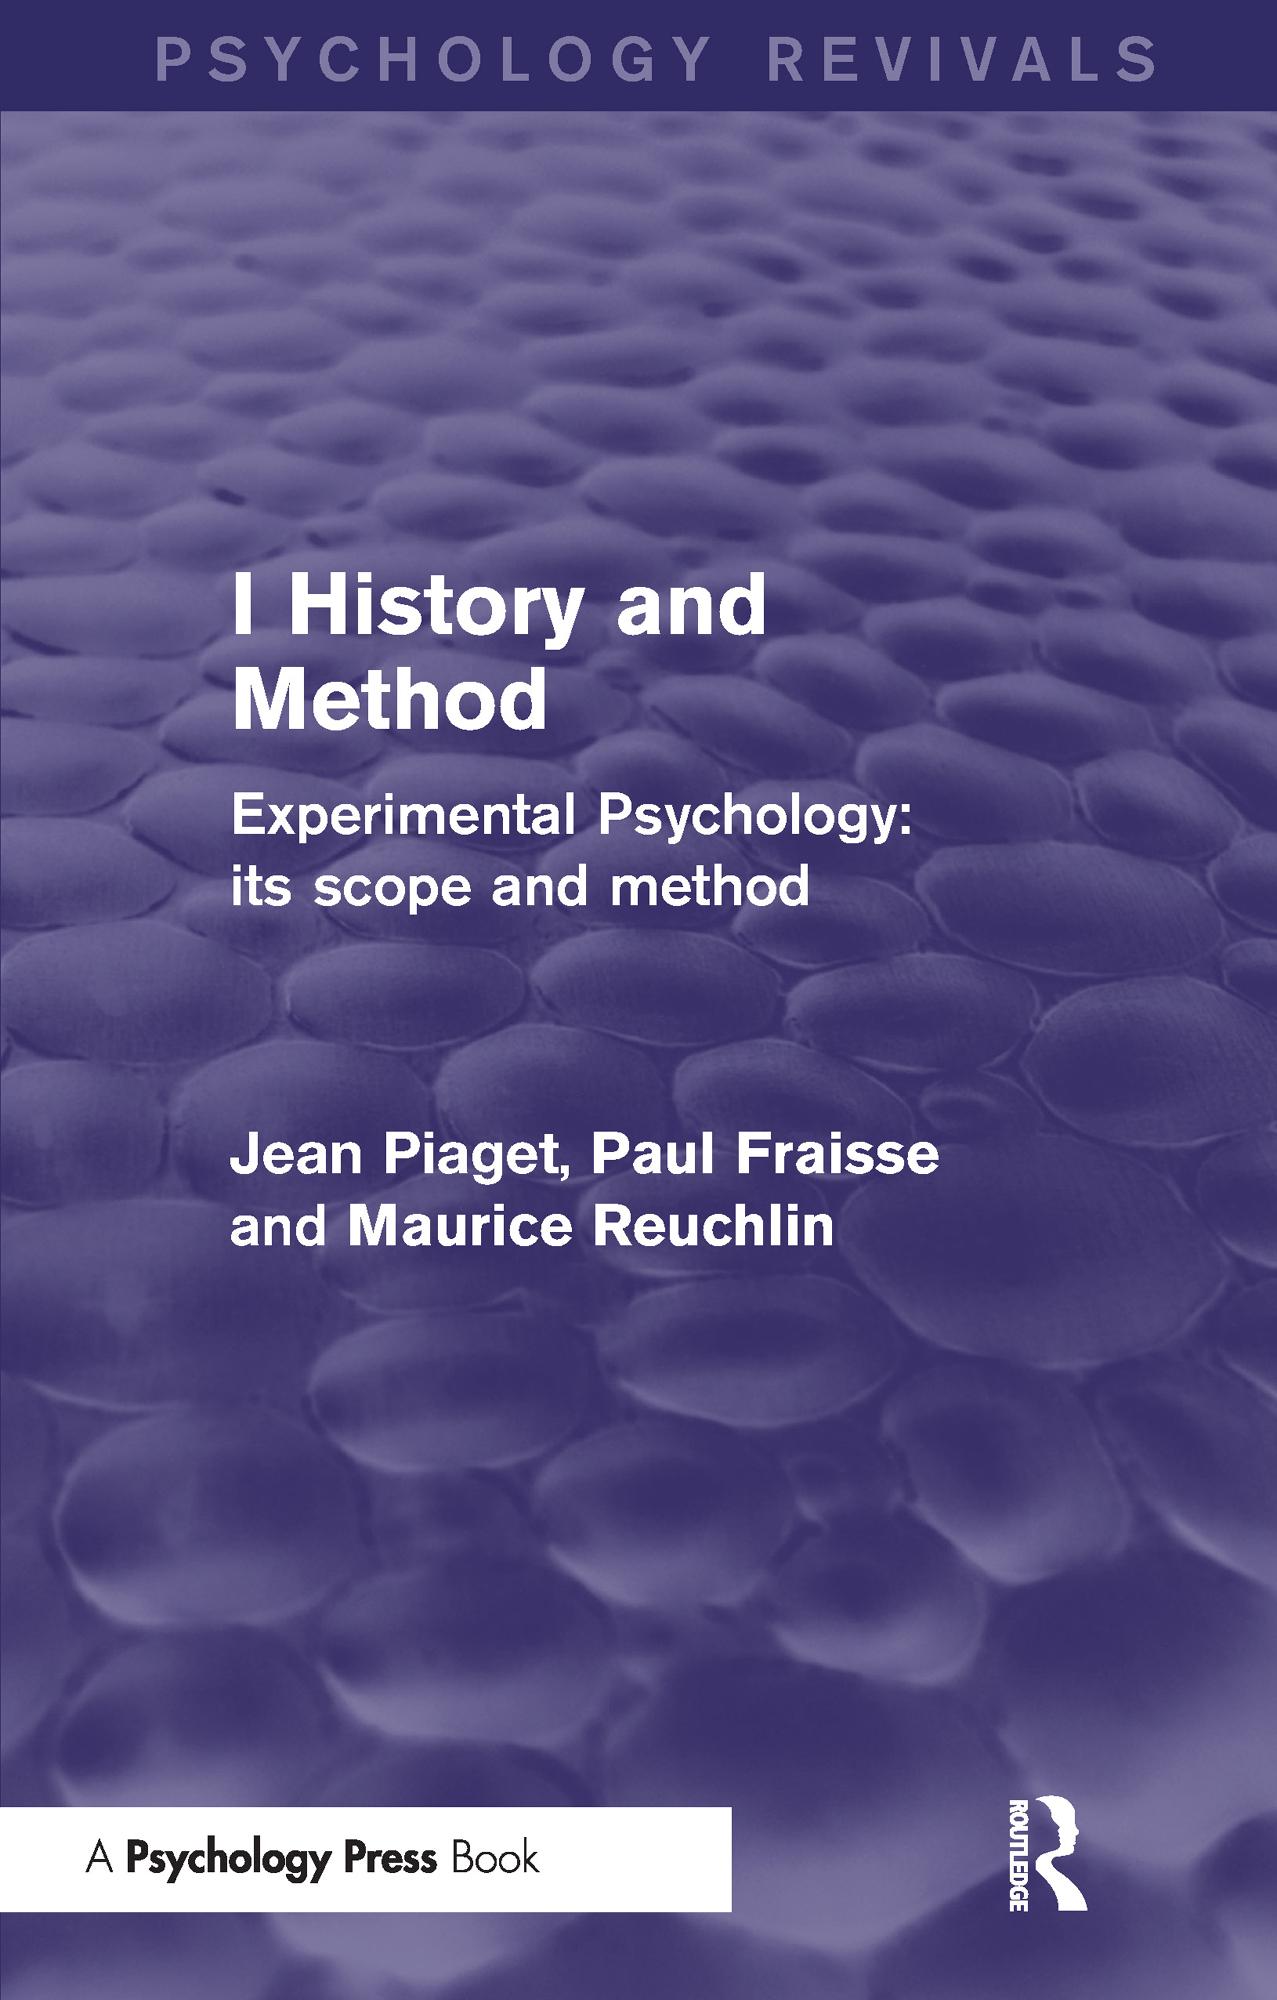 Experimental Psychology Its Scope and Method: Volume I (Psychology Revivals)